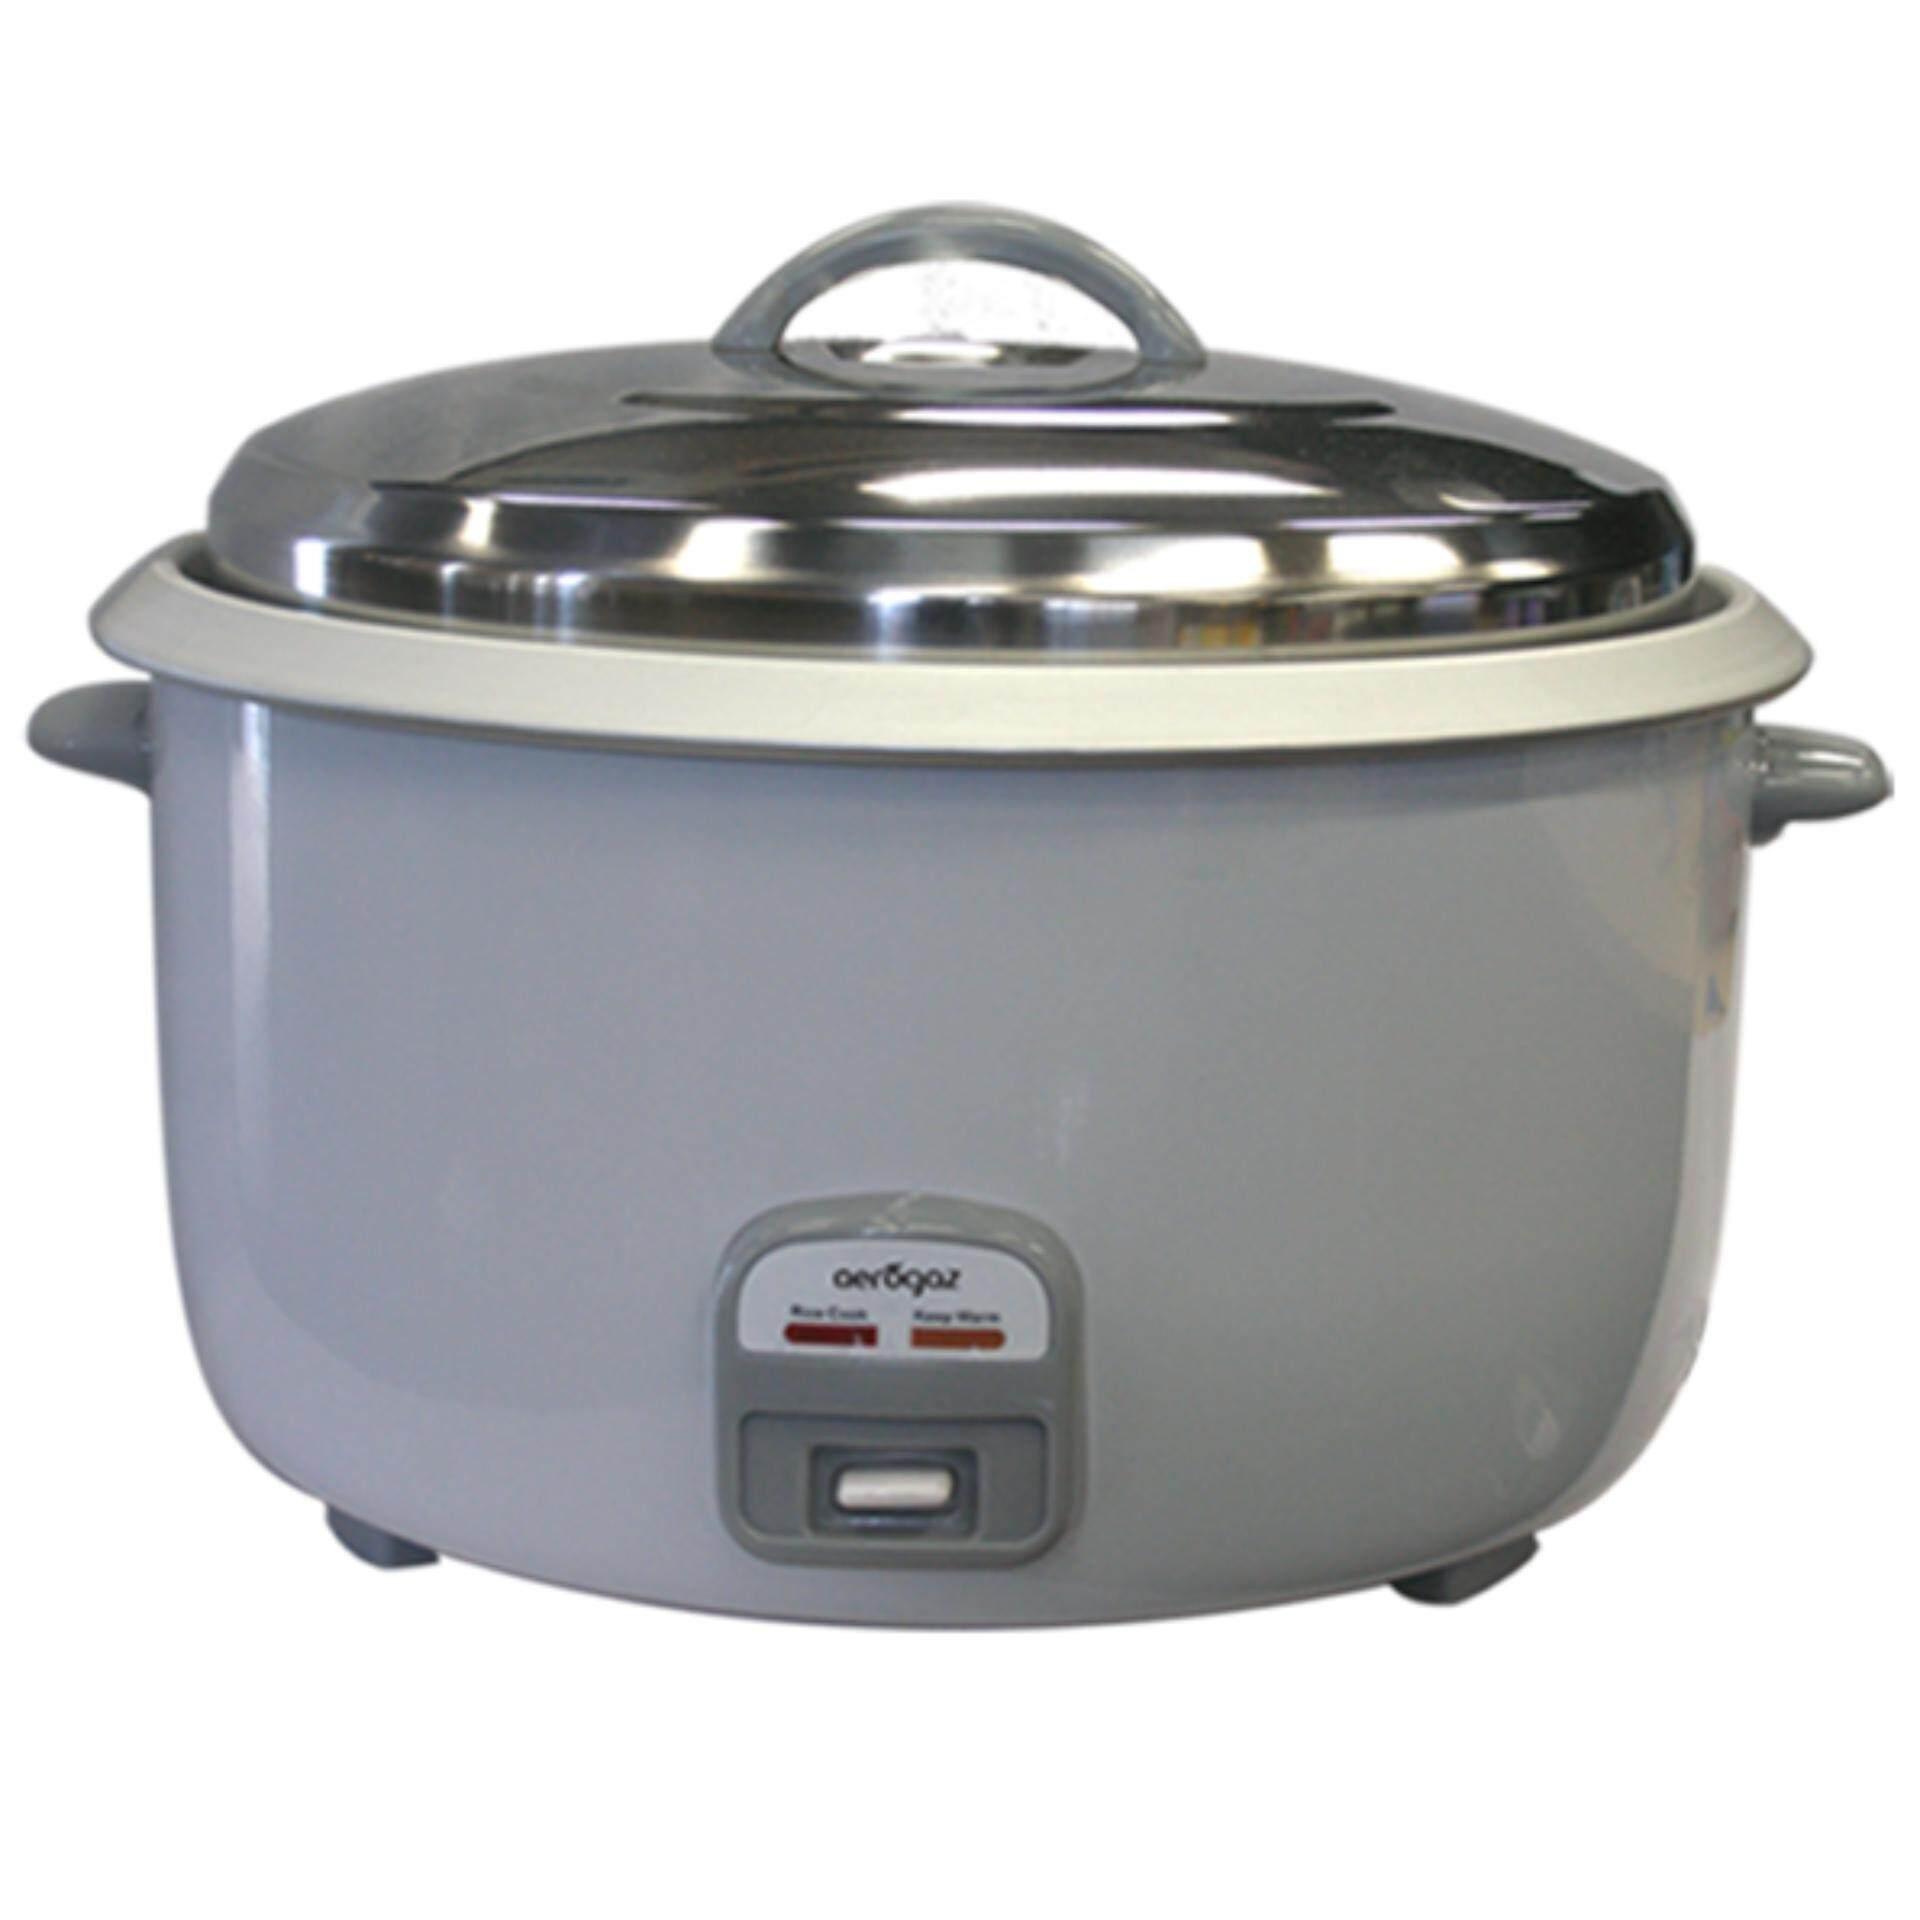 Aerogaz 10L Electric Rice Cooker Az-1008RC